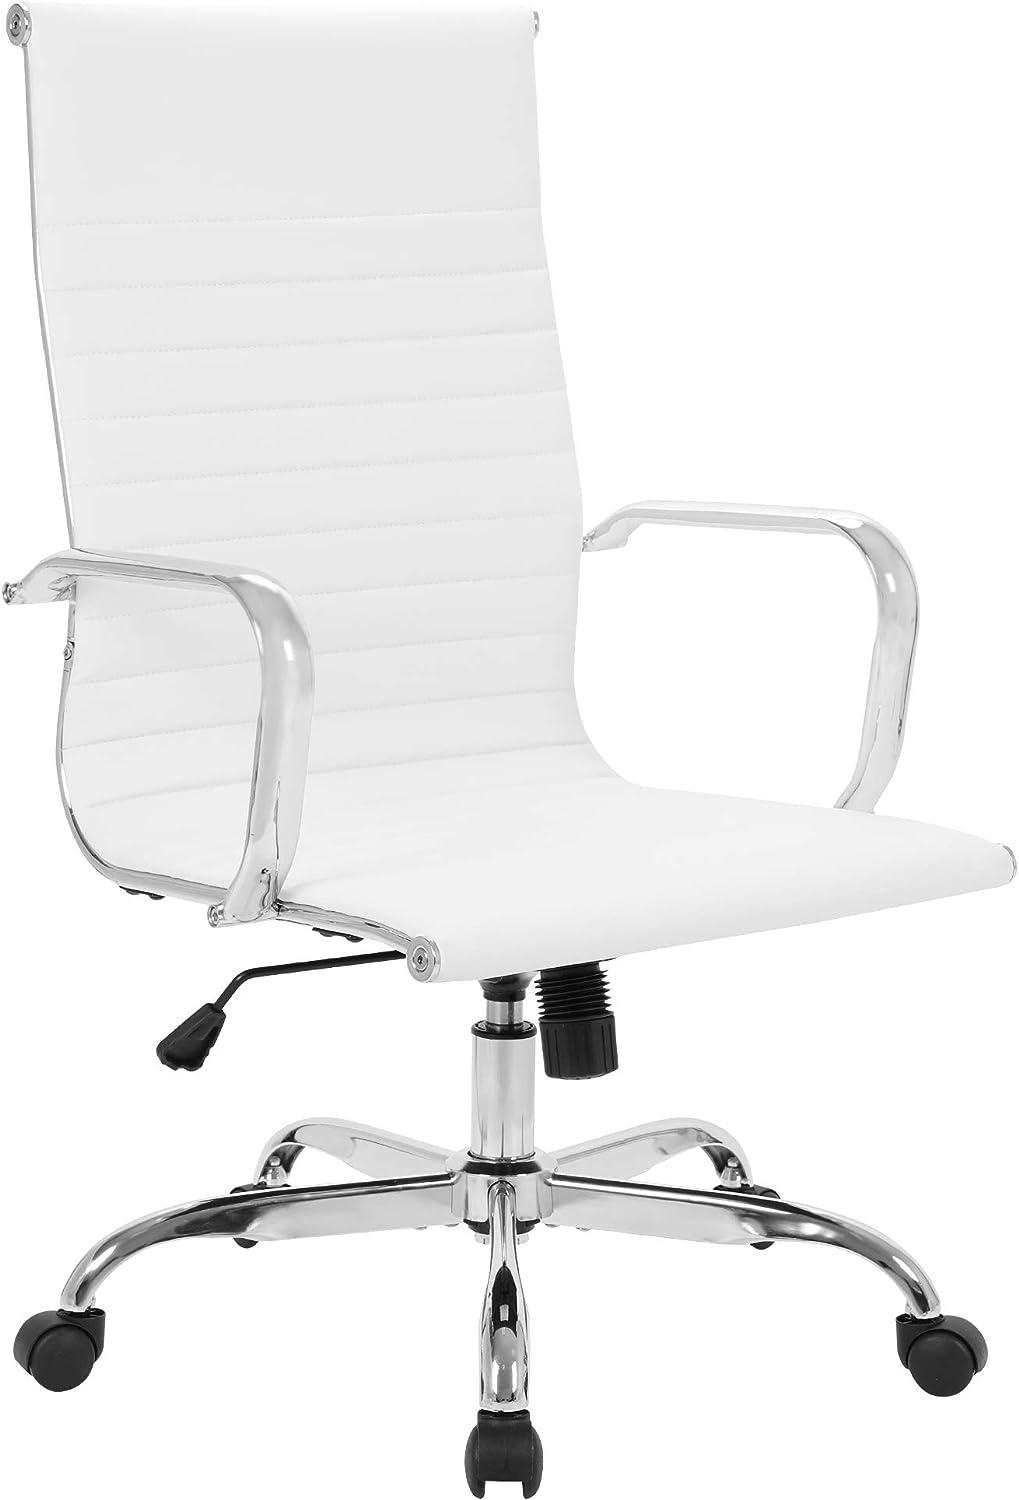 LANDSUN Modern High Back Office Chair Leather Ribbed Swivel Tilt Adjustable Home Computer Desk Chair with Armrest Executive Ergonomic White